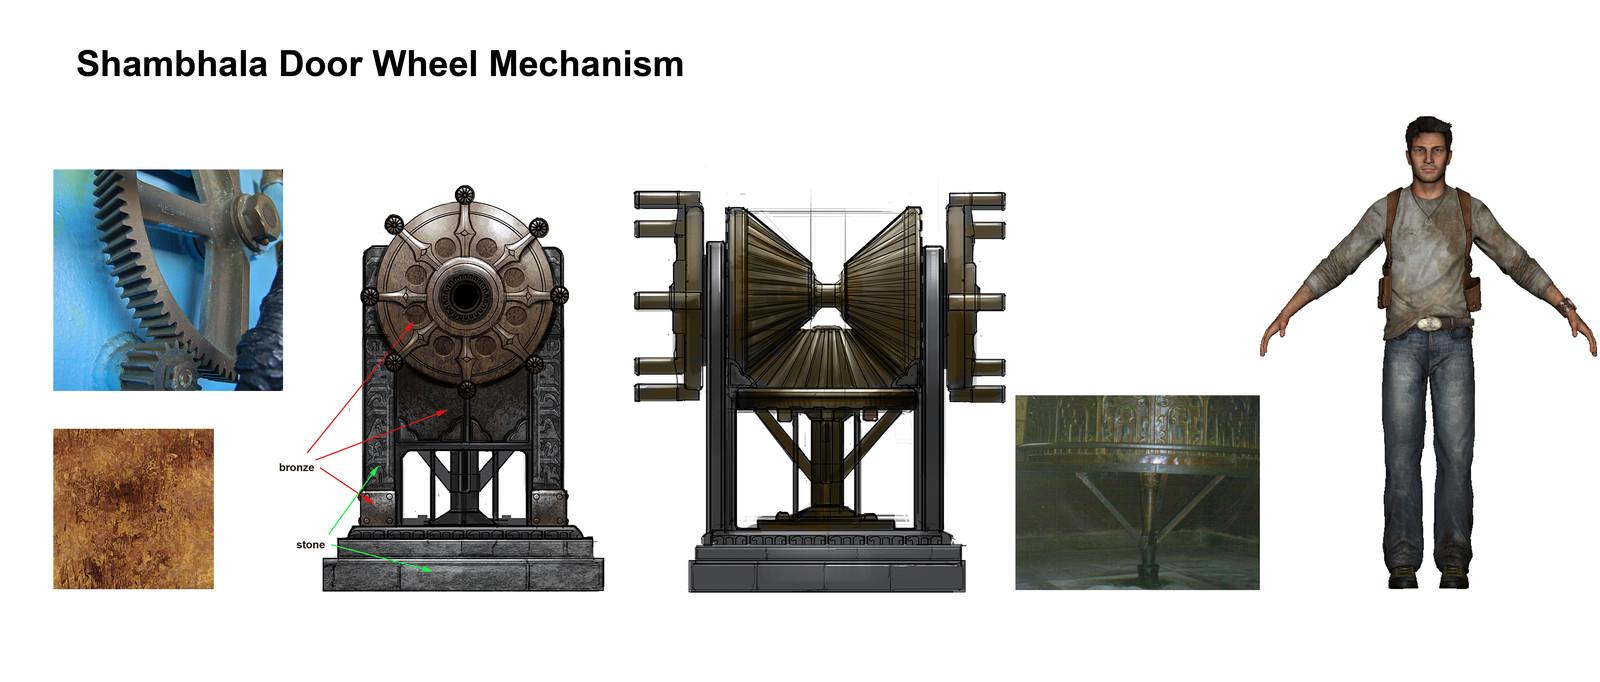 Shambhala gate opening crank wheel